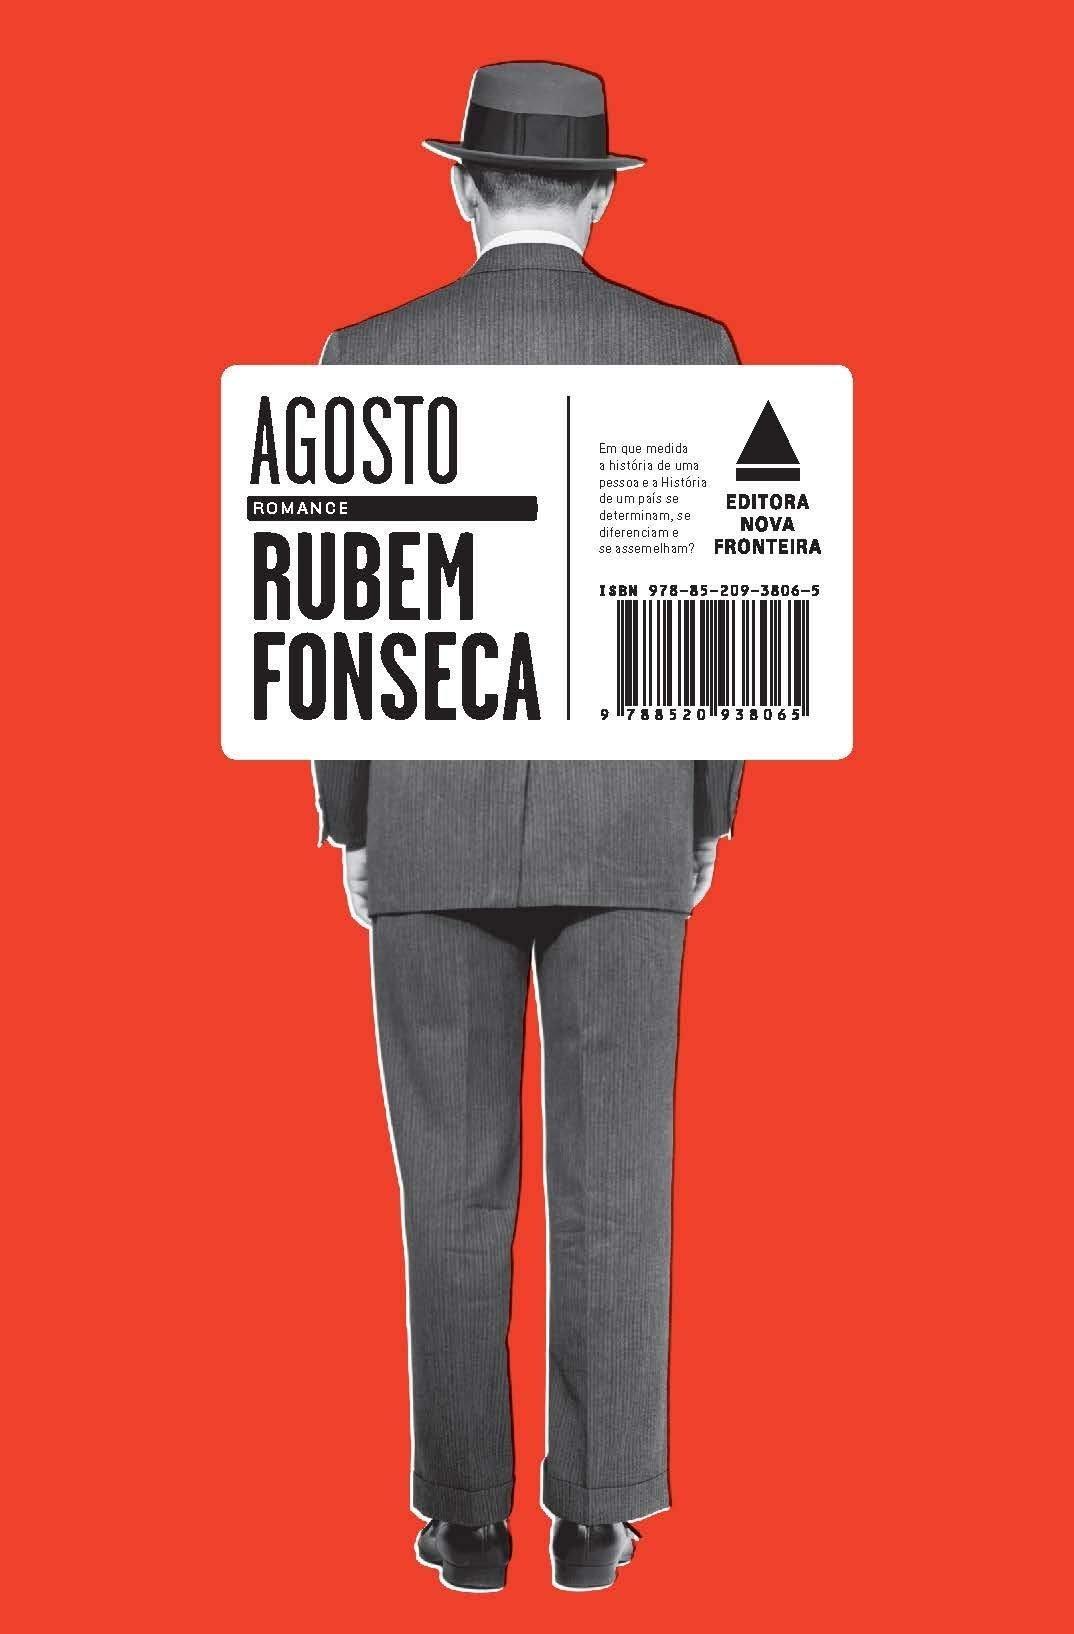 """Agosto"", romance de Rubem Fonseca"